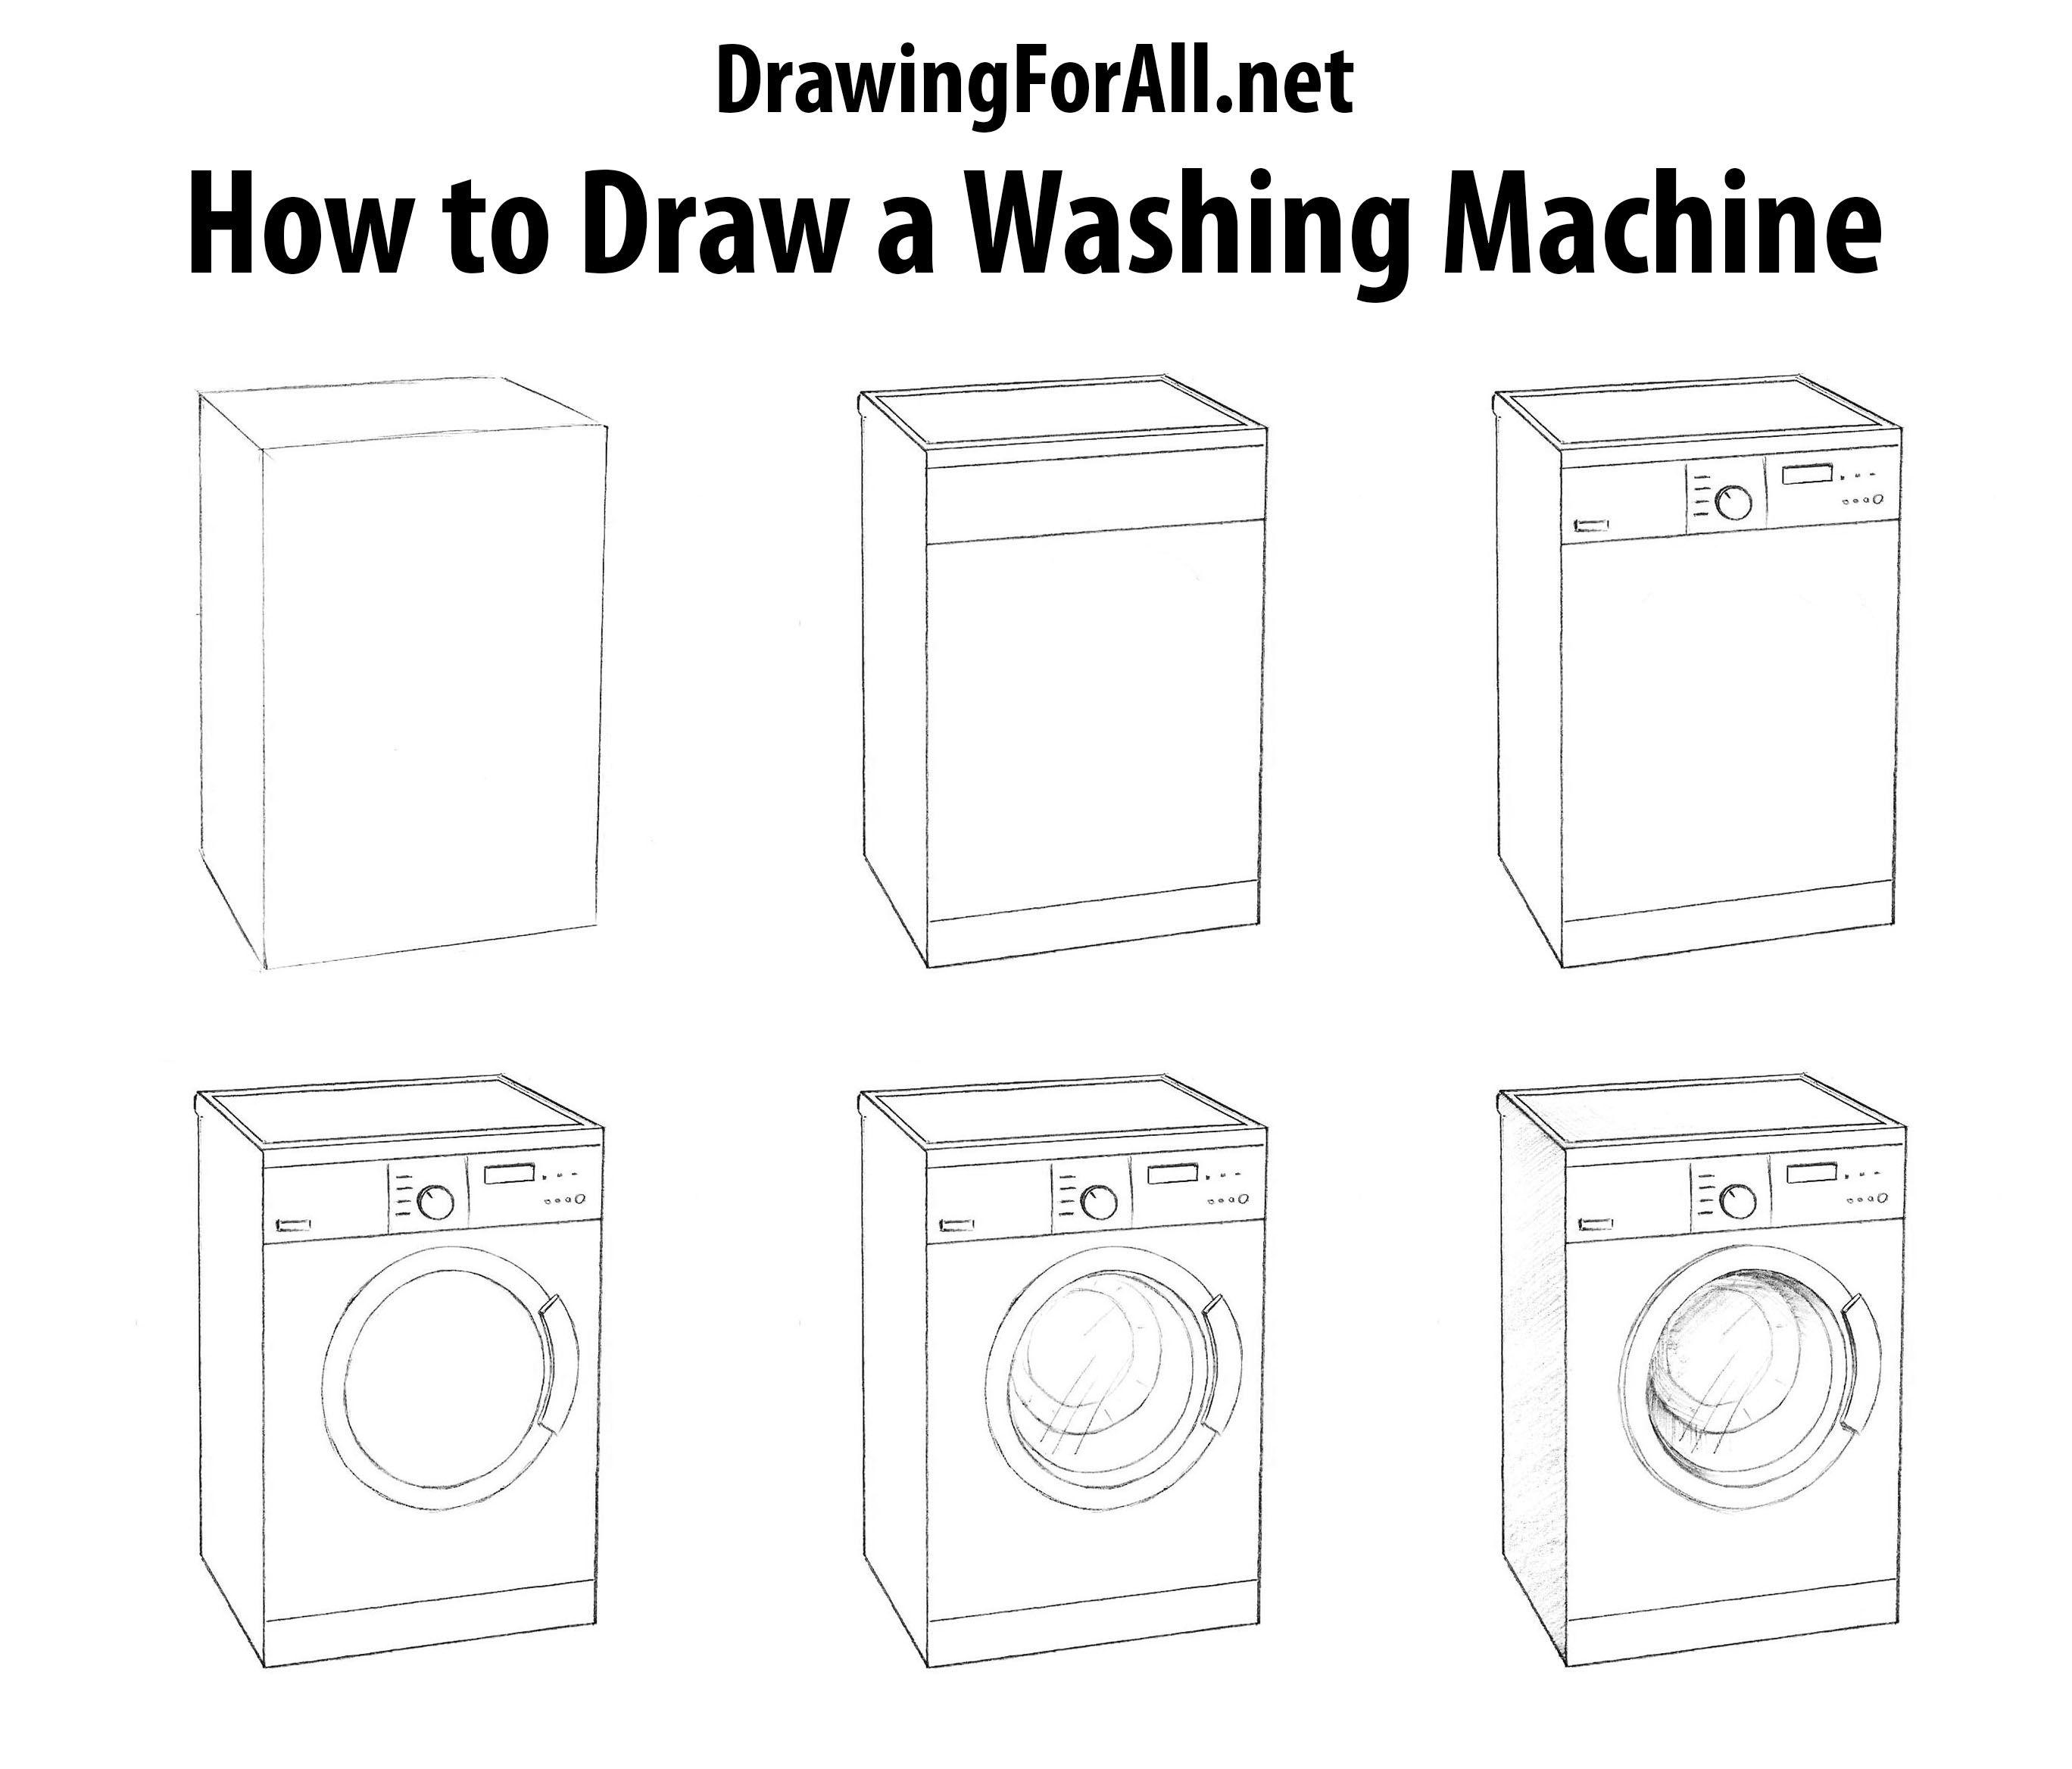 Washing Machine Drawing ~ How to draw a washing machine http drawingforall